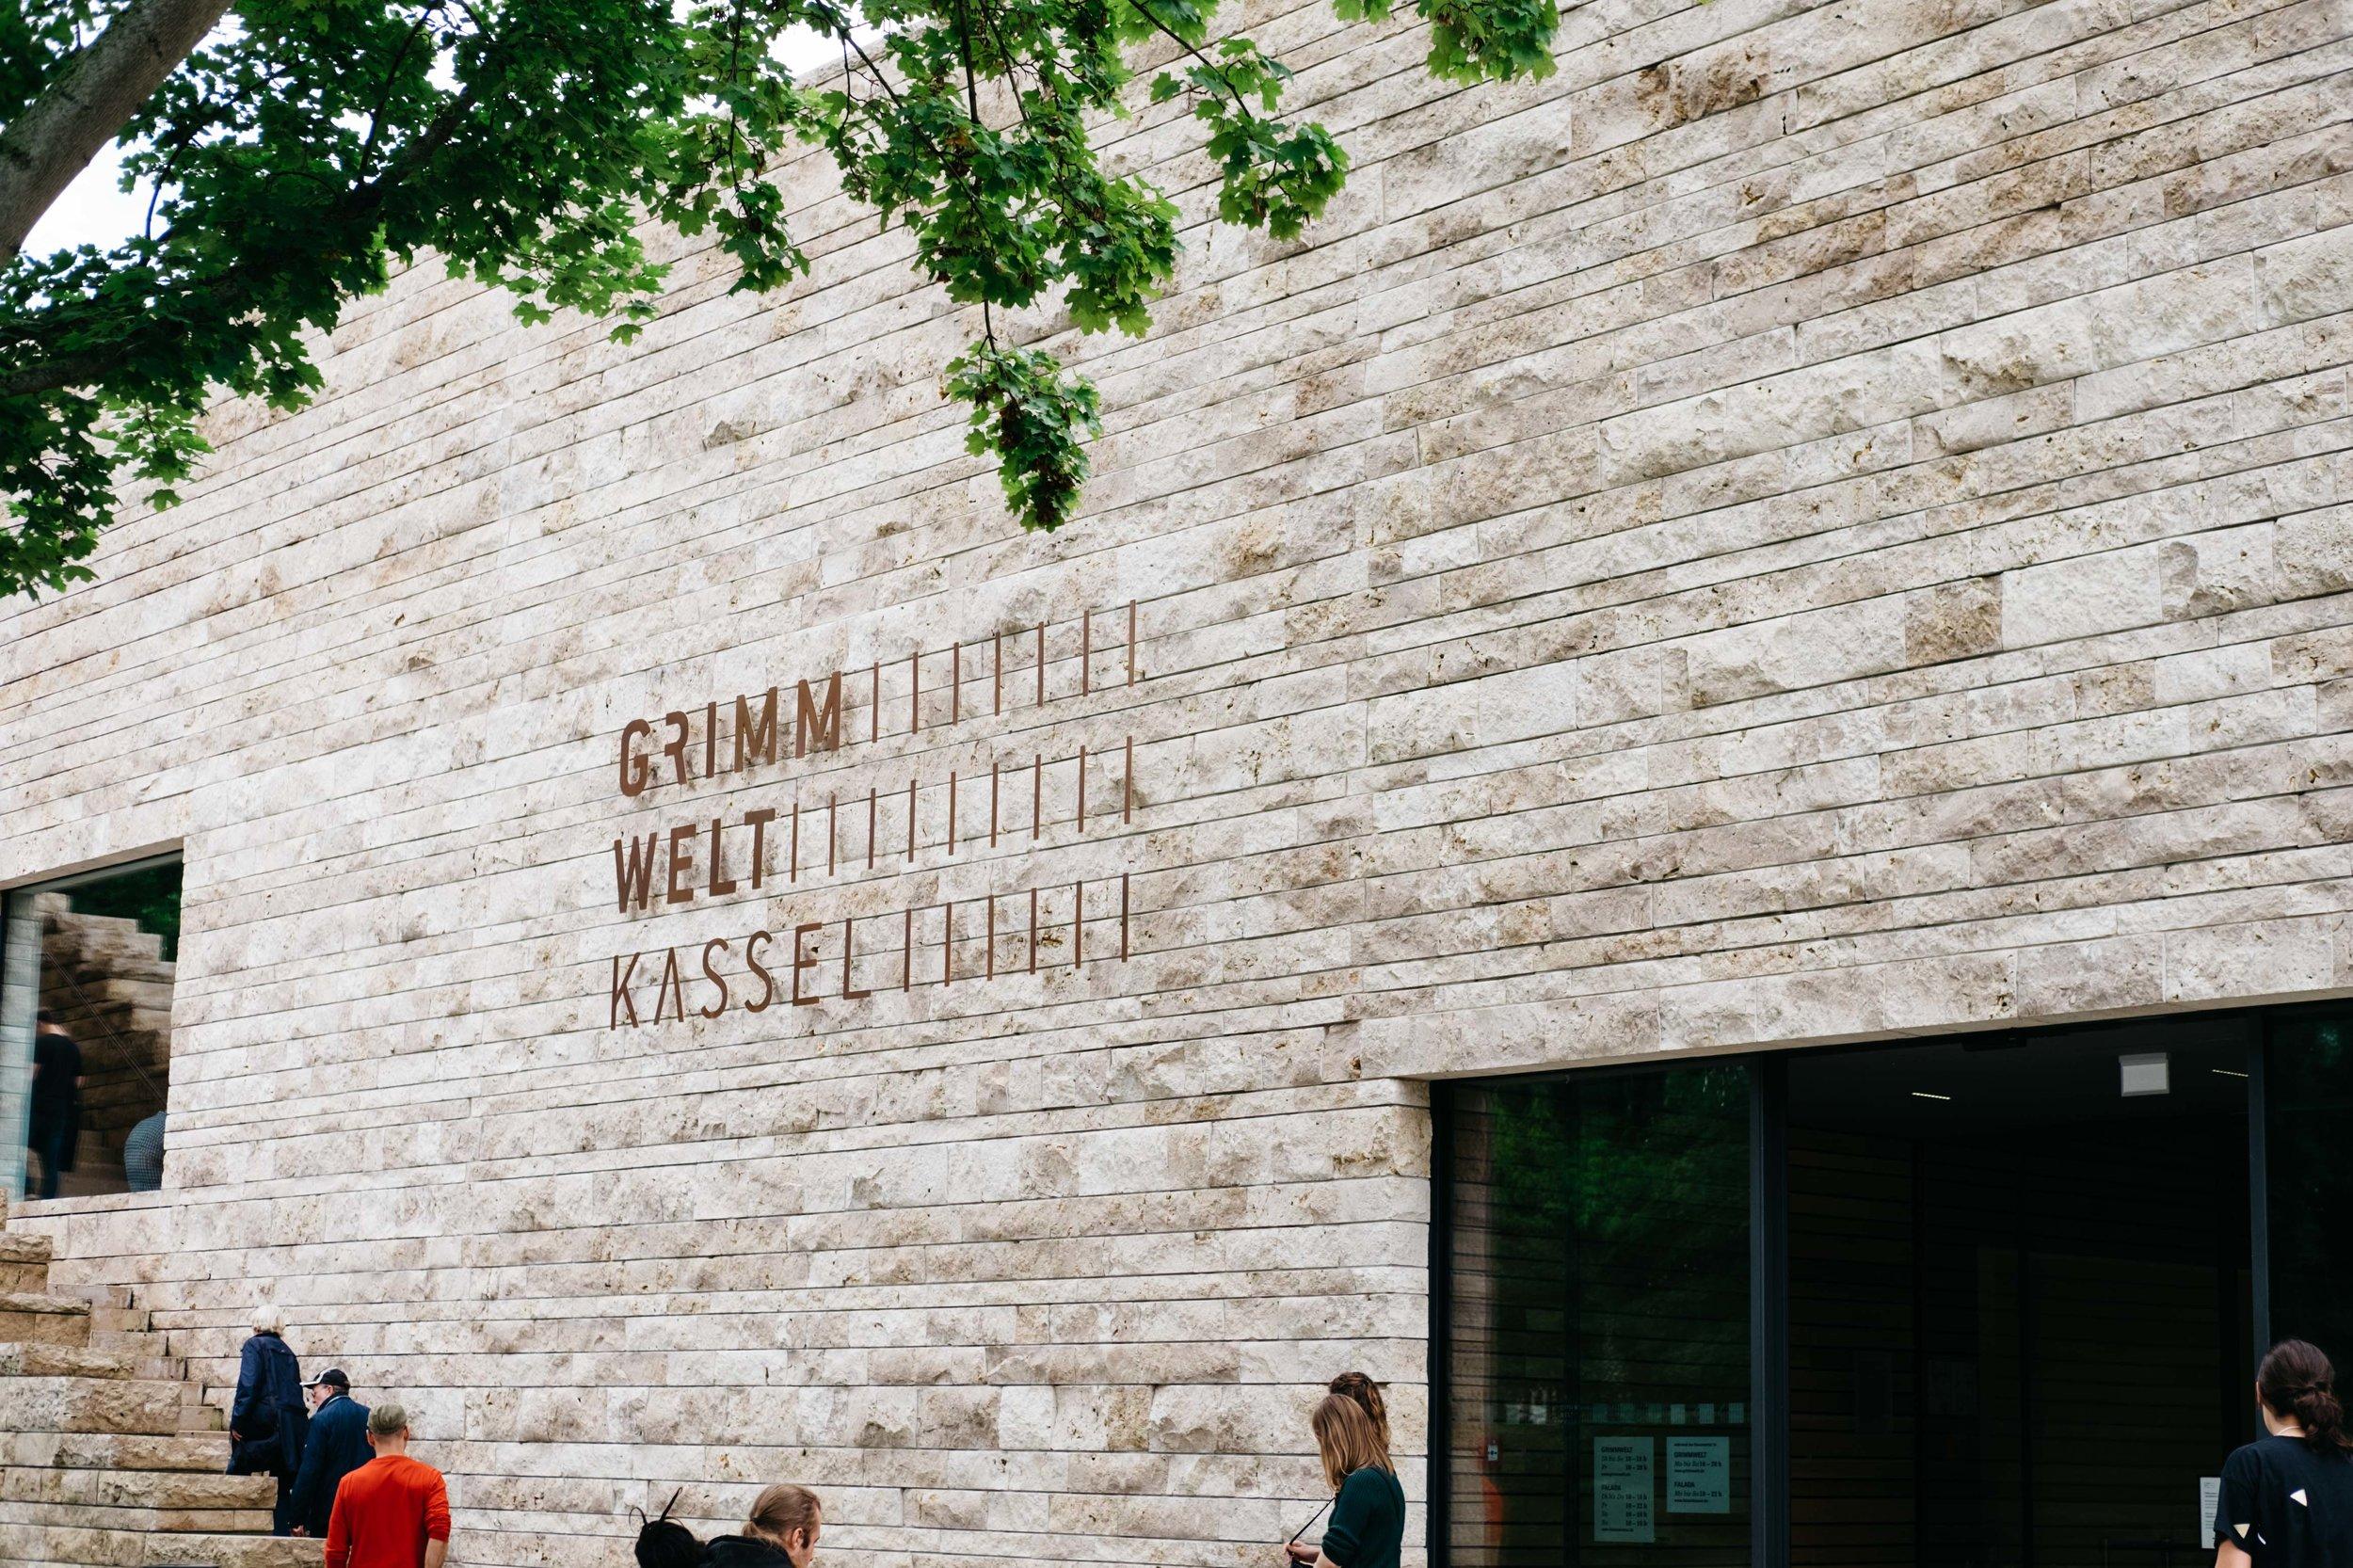 documenta14-kassel-kunst-wearecity-simonhariman-2017-55.jpg